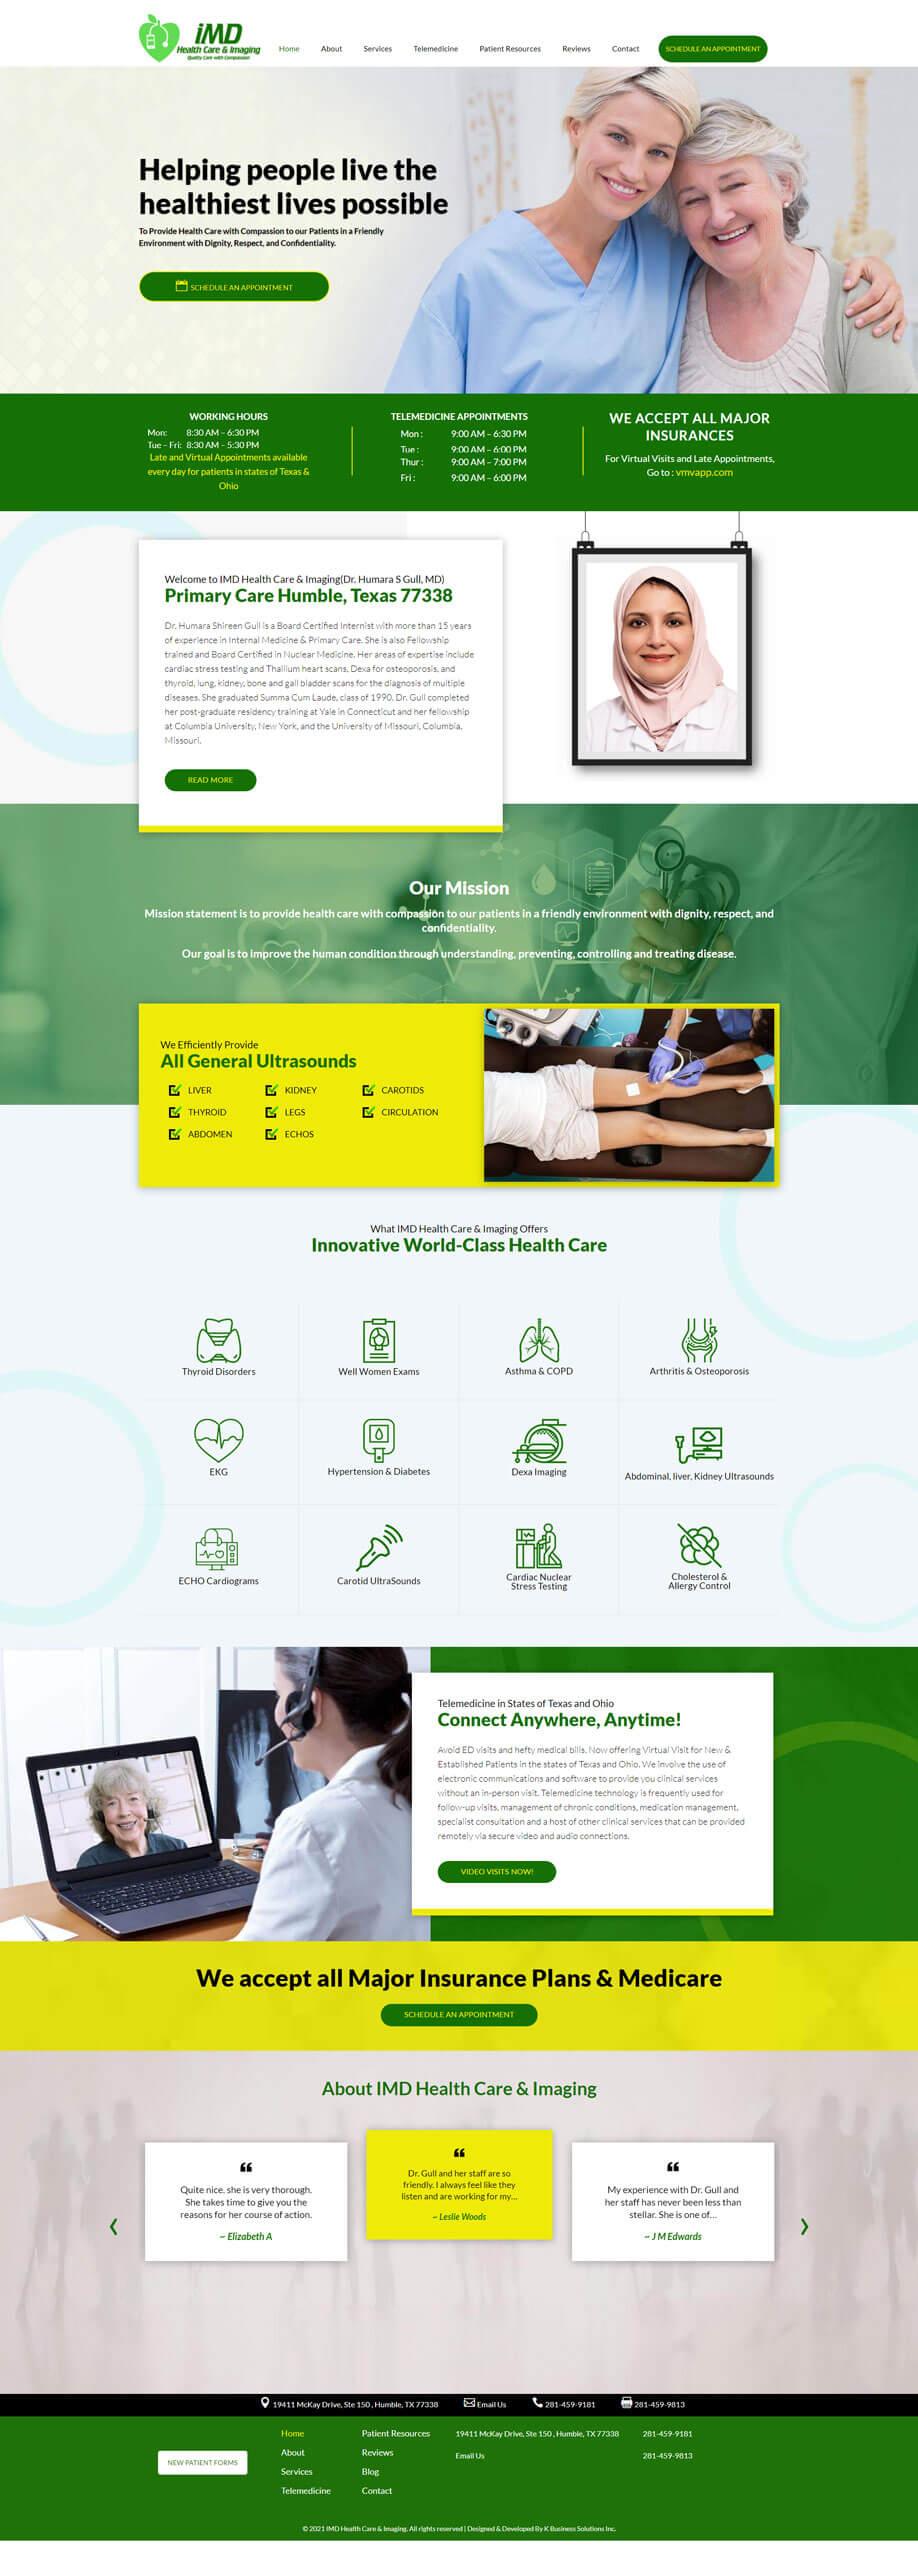 IMD HealthCare